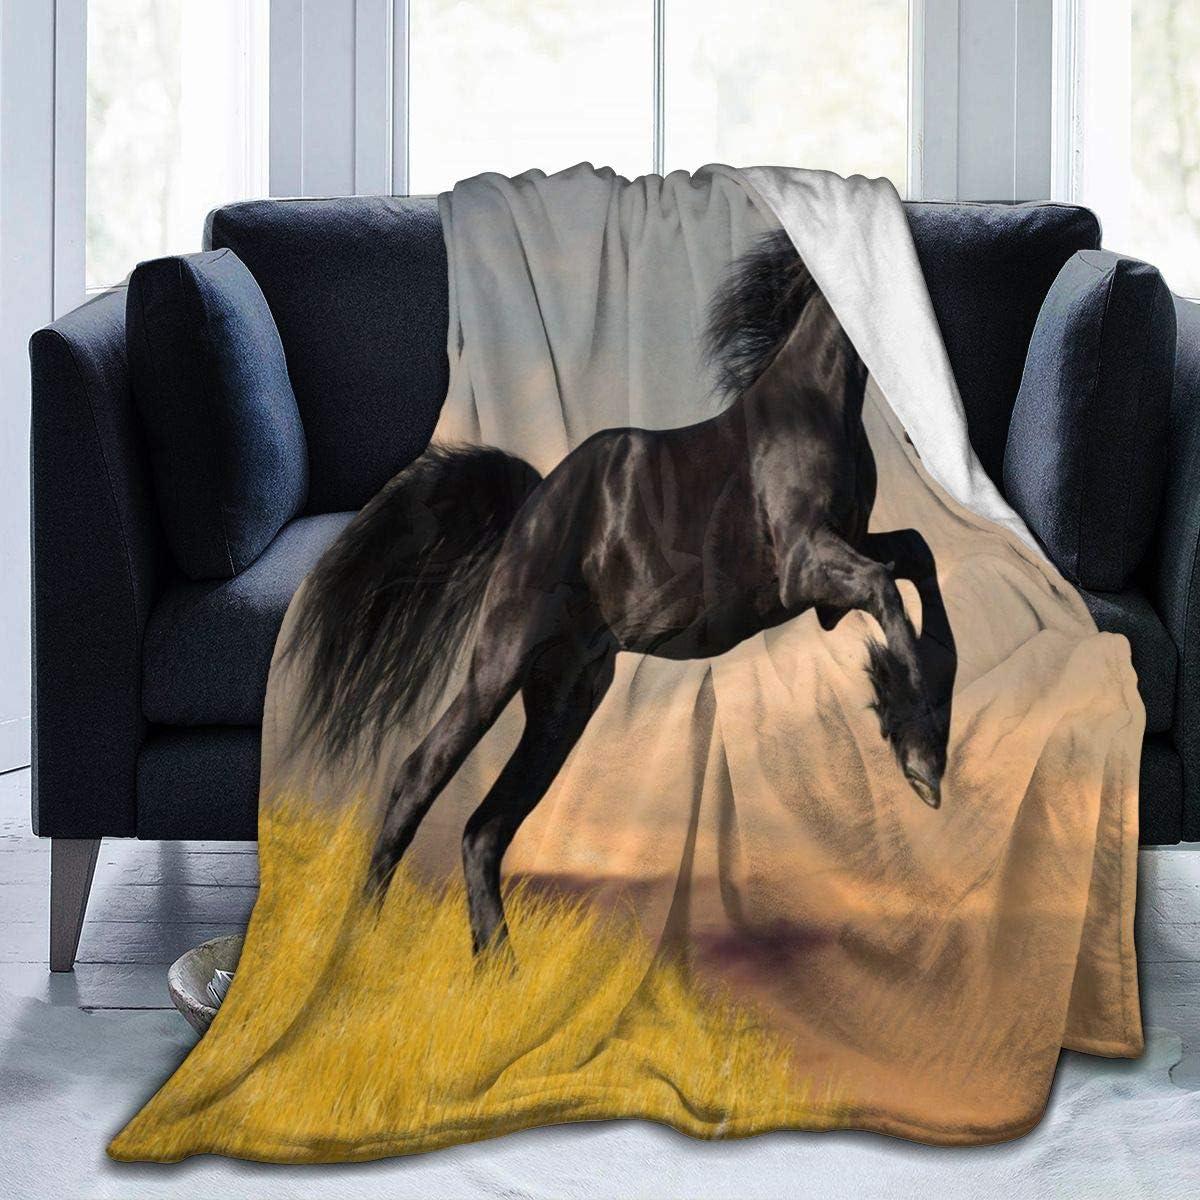 Micro Fleece Plush Soft Baby Blanket Black Mustang Horse Fluffy Warm Toddler Bed/Crib Blanket Lightweight Flannel Daycare Nap Kids Sleeping Tummy Time Throw Blanket Girls Boy Clearance 40x50inch kid/b